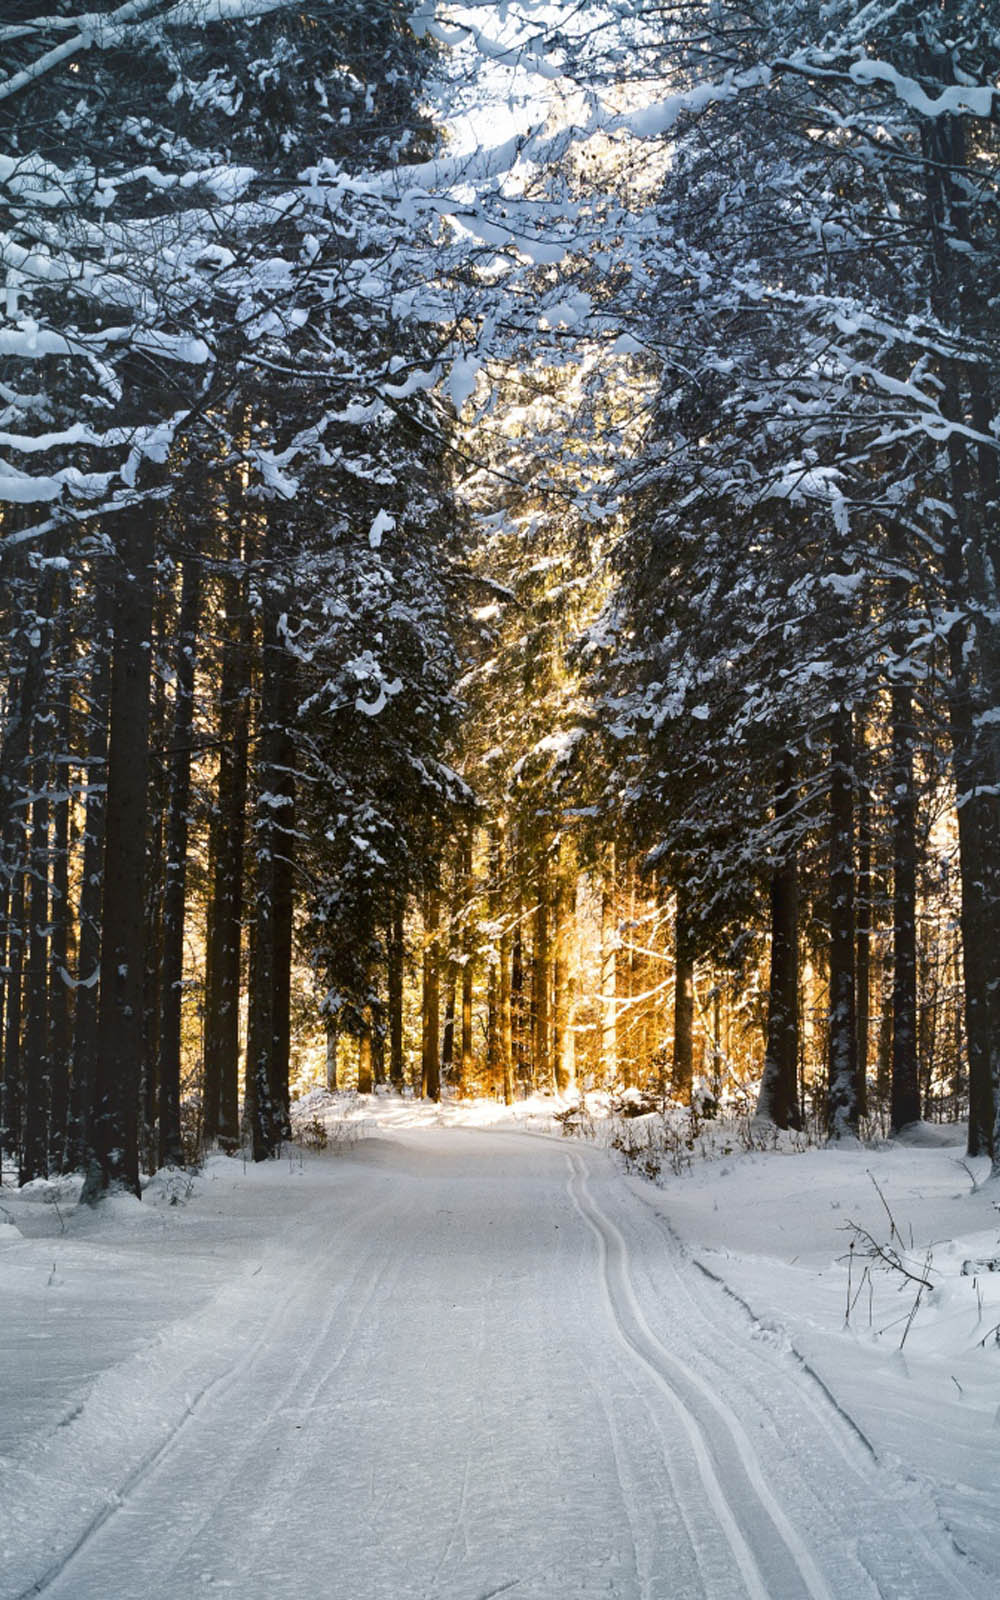 Winter Snow Road Morning Sunrise Free 4K Ultra HD Mobile ...